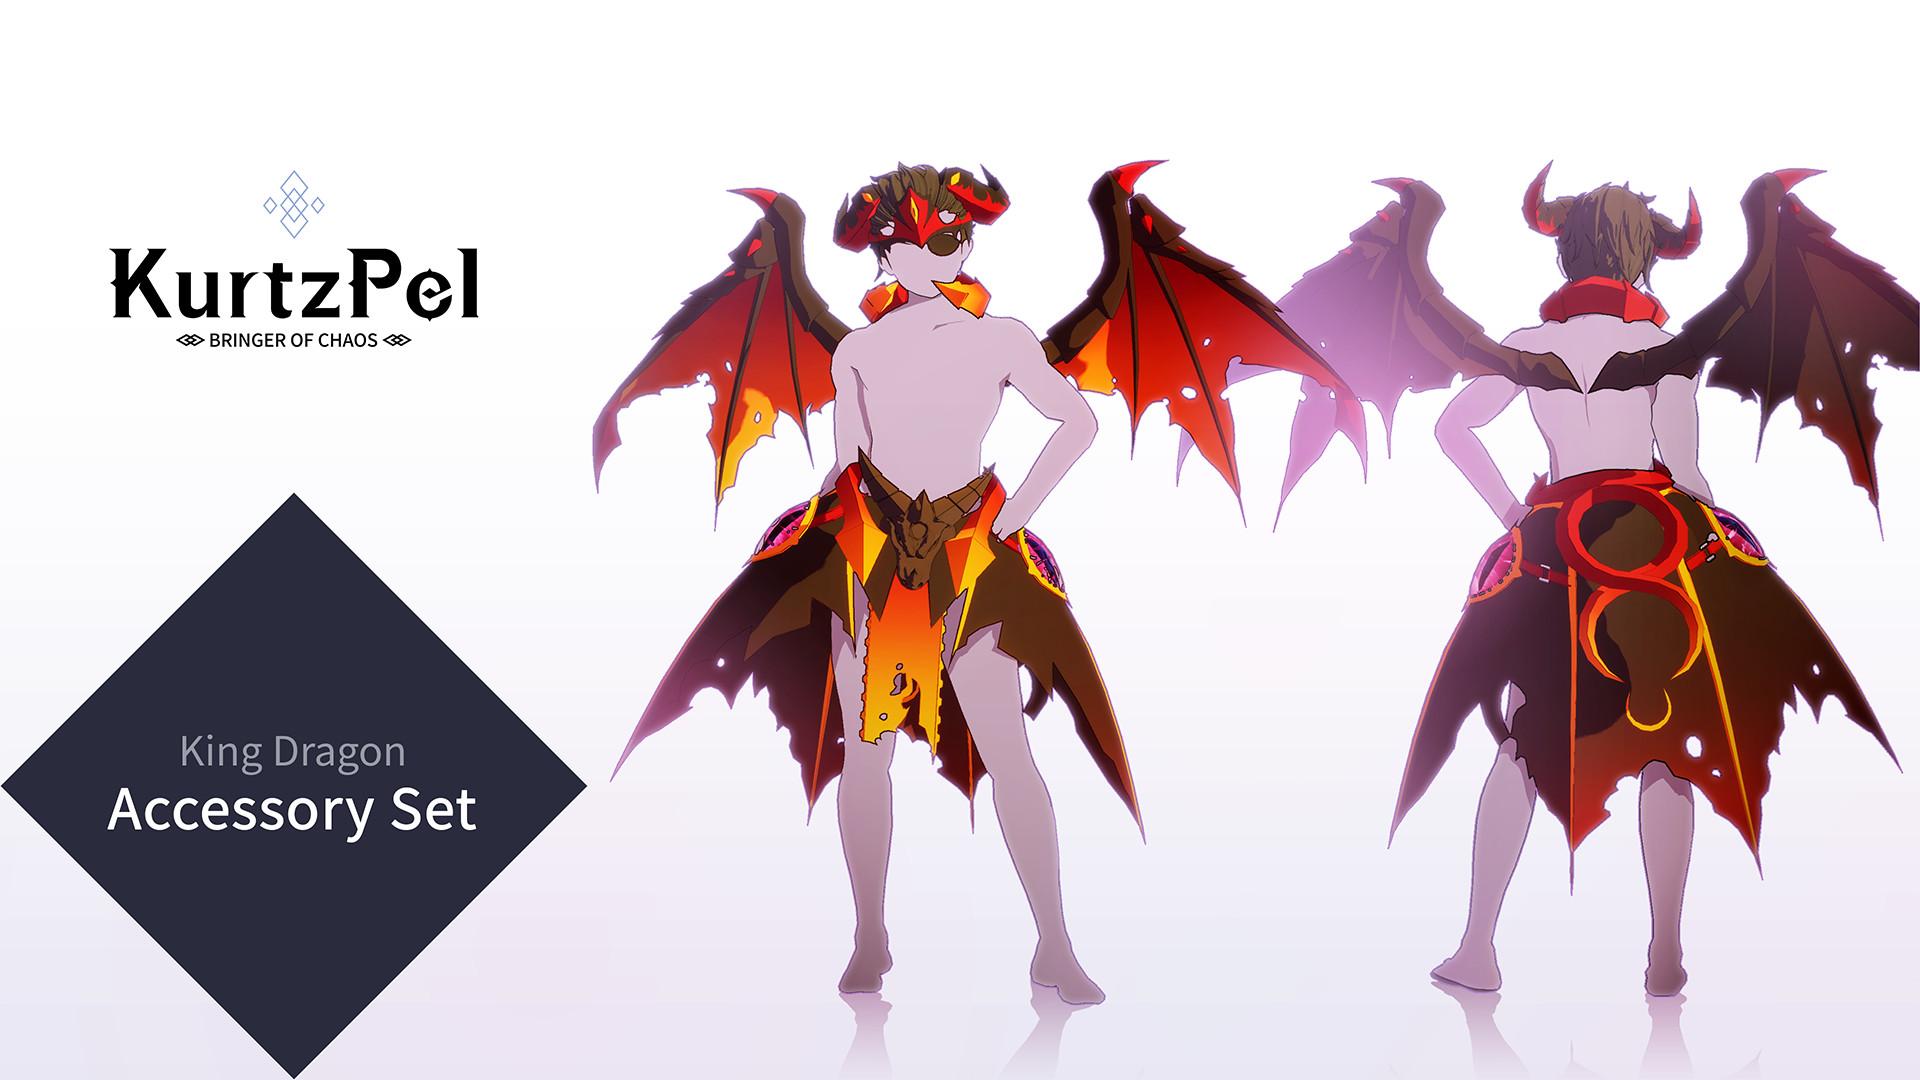 KurtzPel - King Dragon Accessory Set screenshot